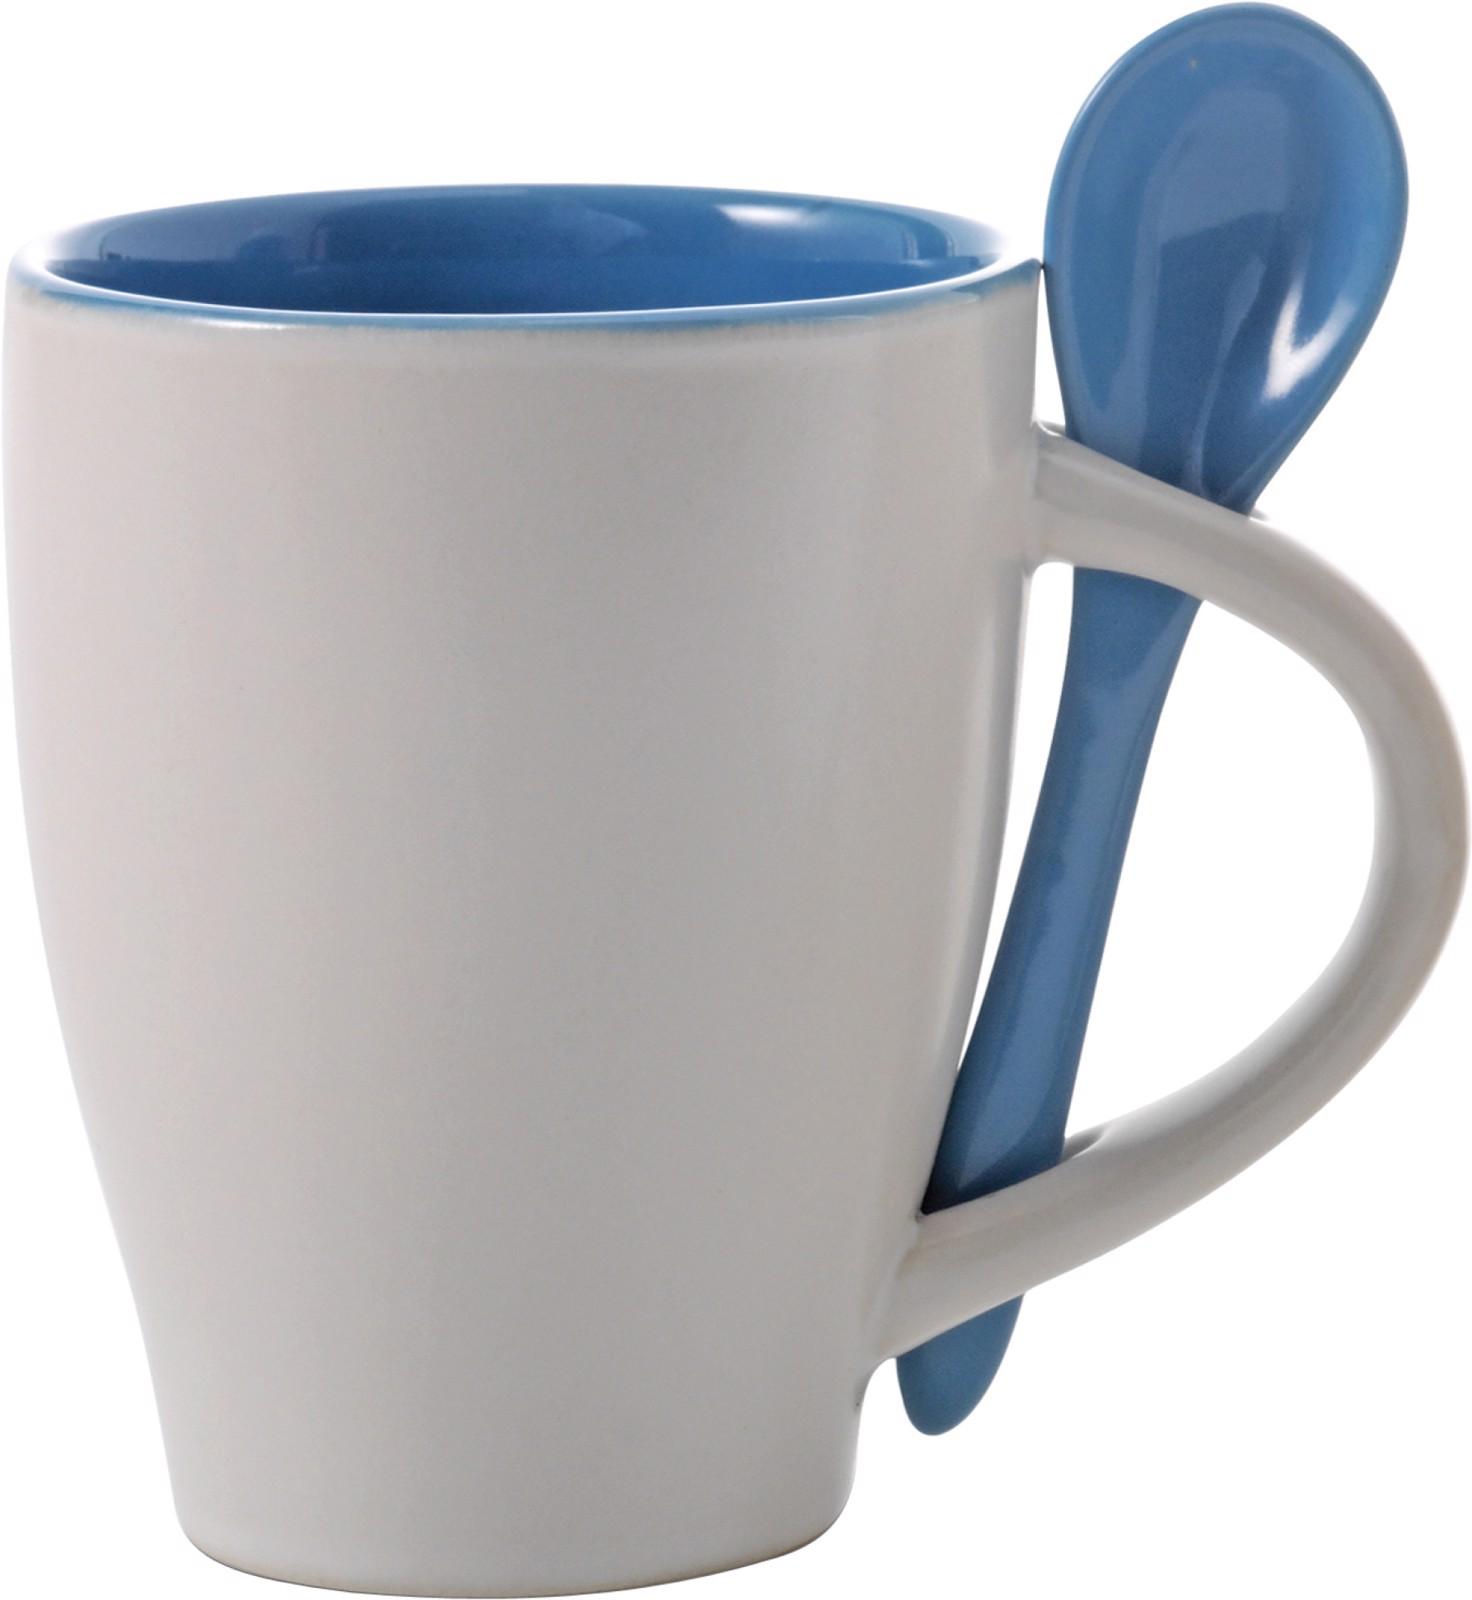 Ceramic mug with spoon - Light Blue